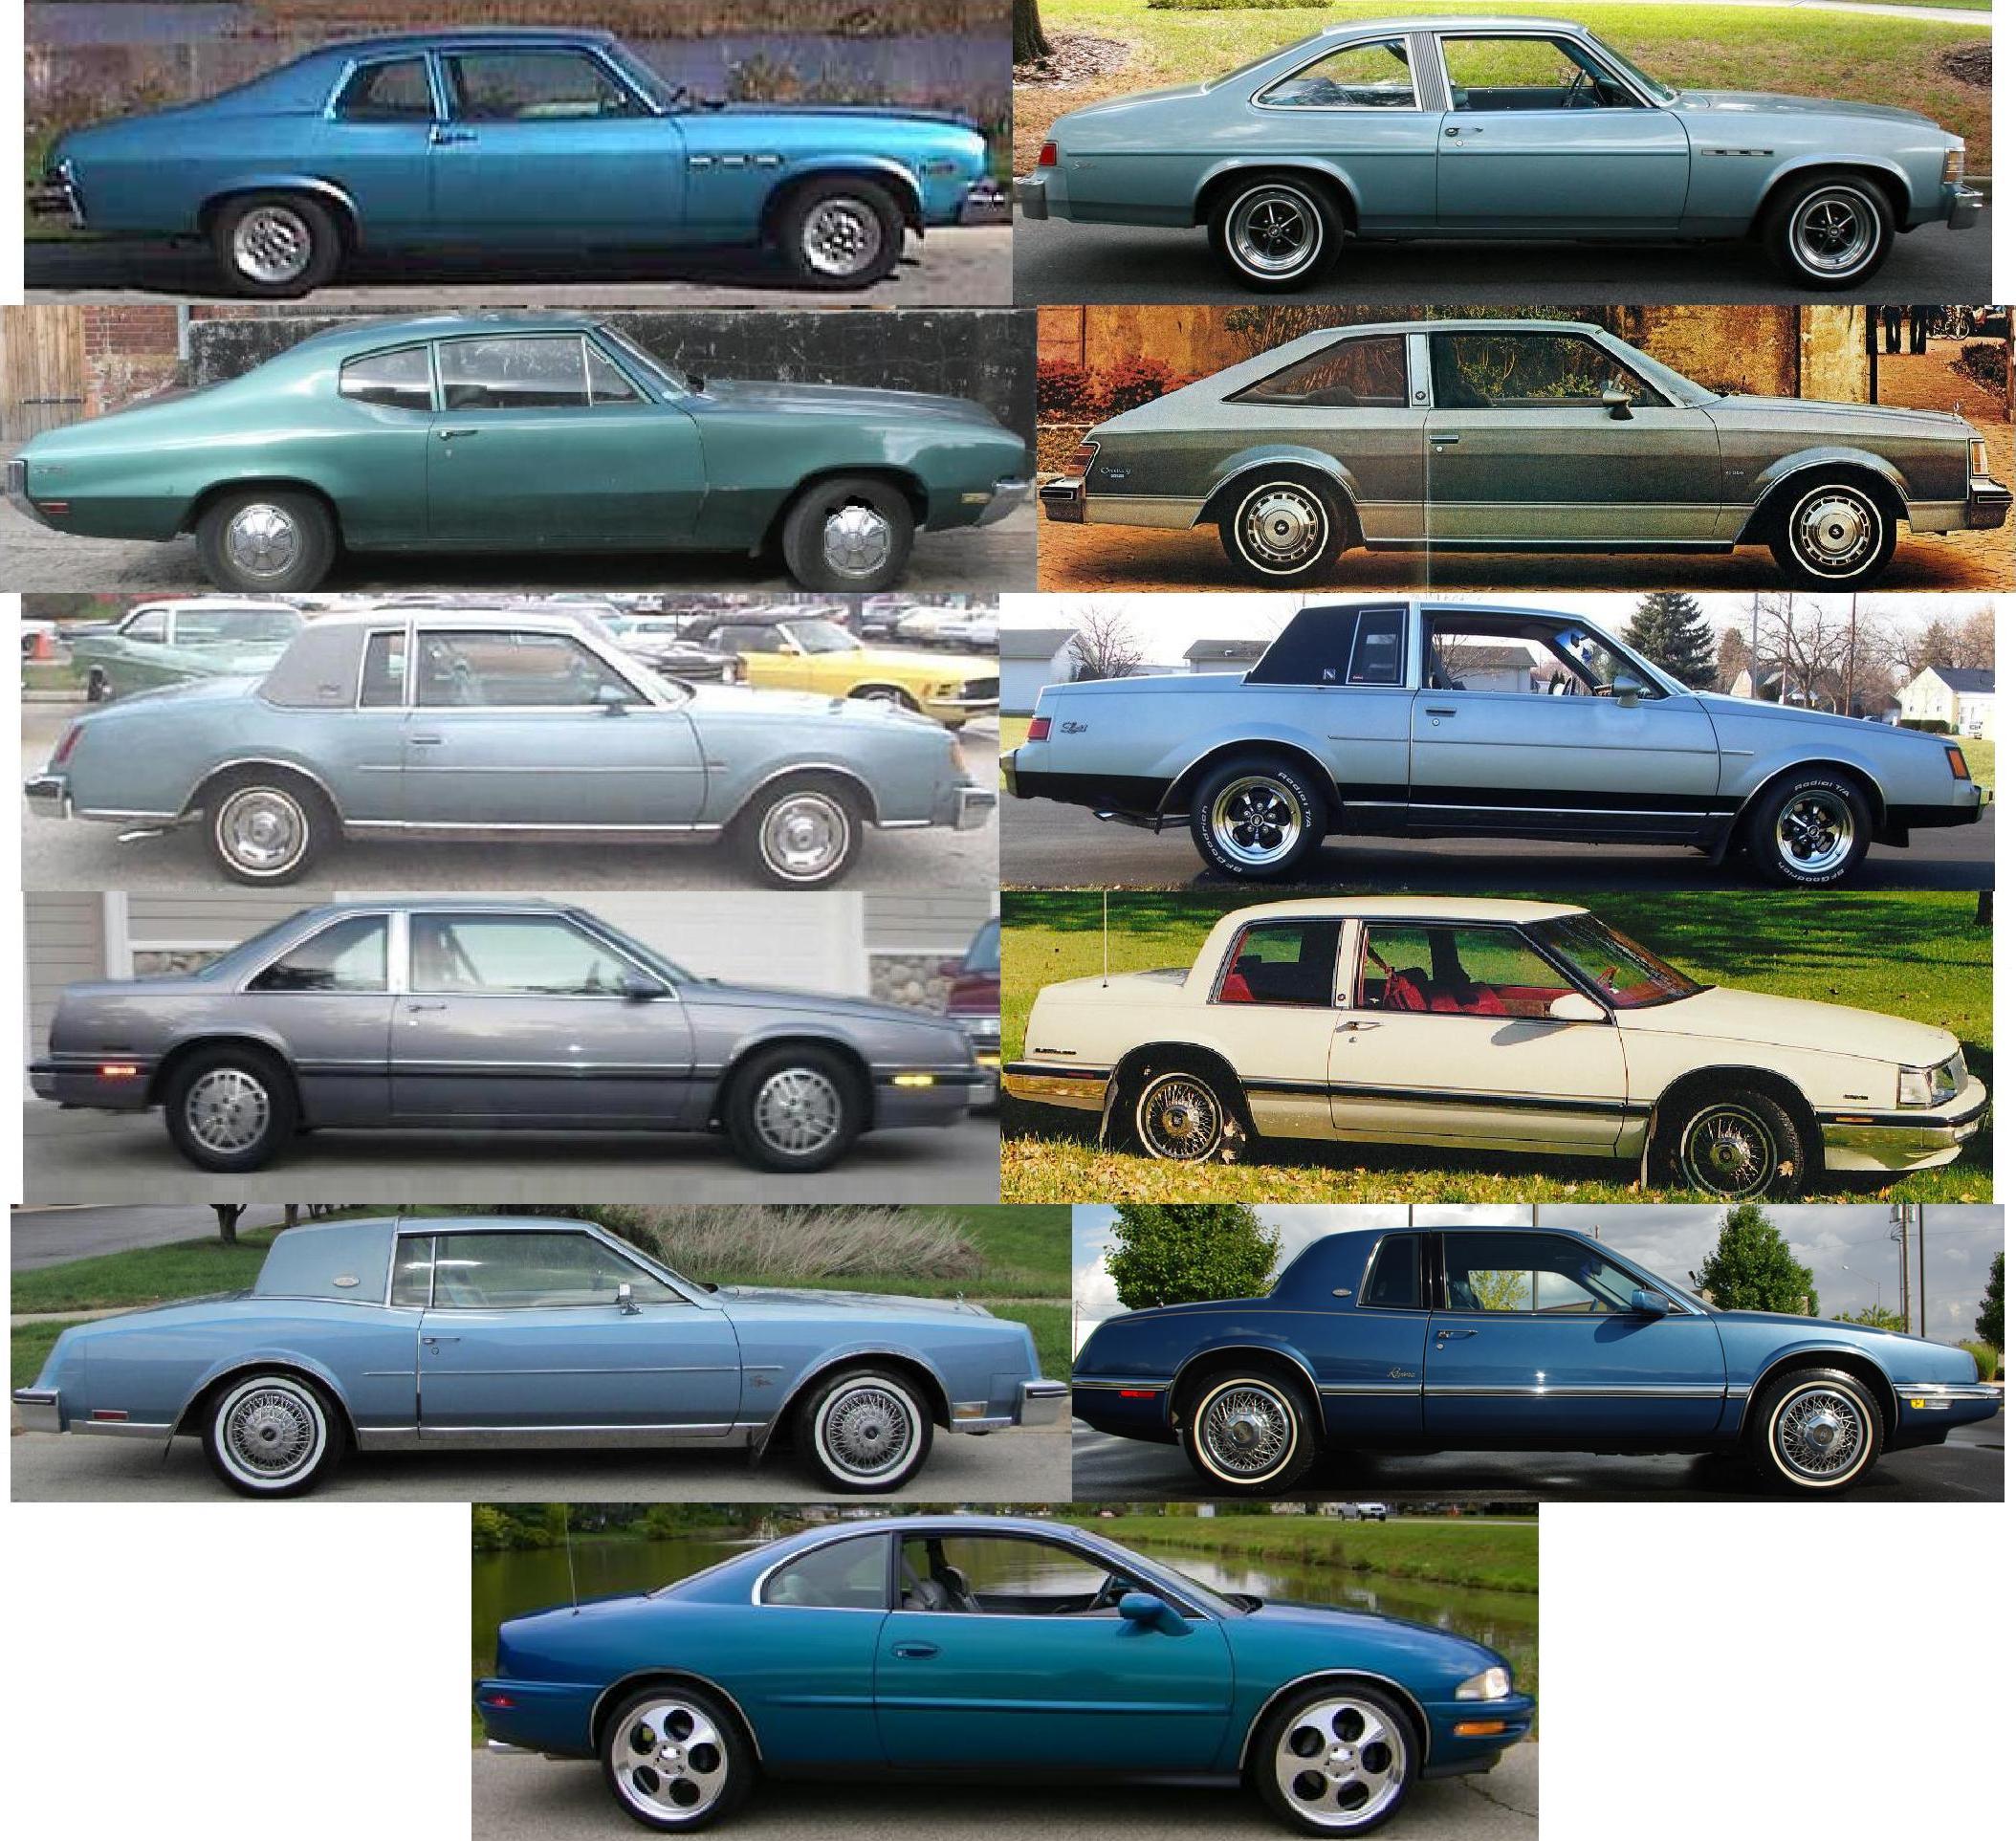 Craigslist Classic 1979 Buick Regal Very Clean